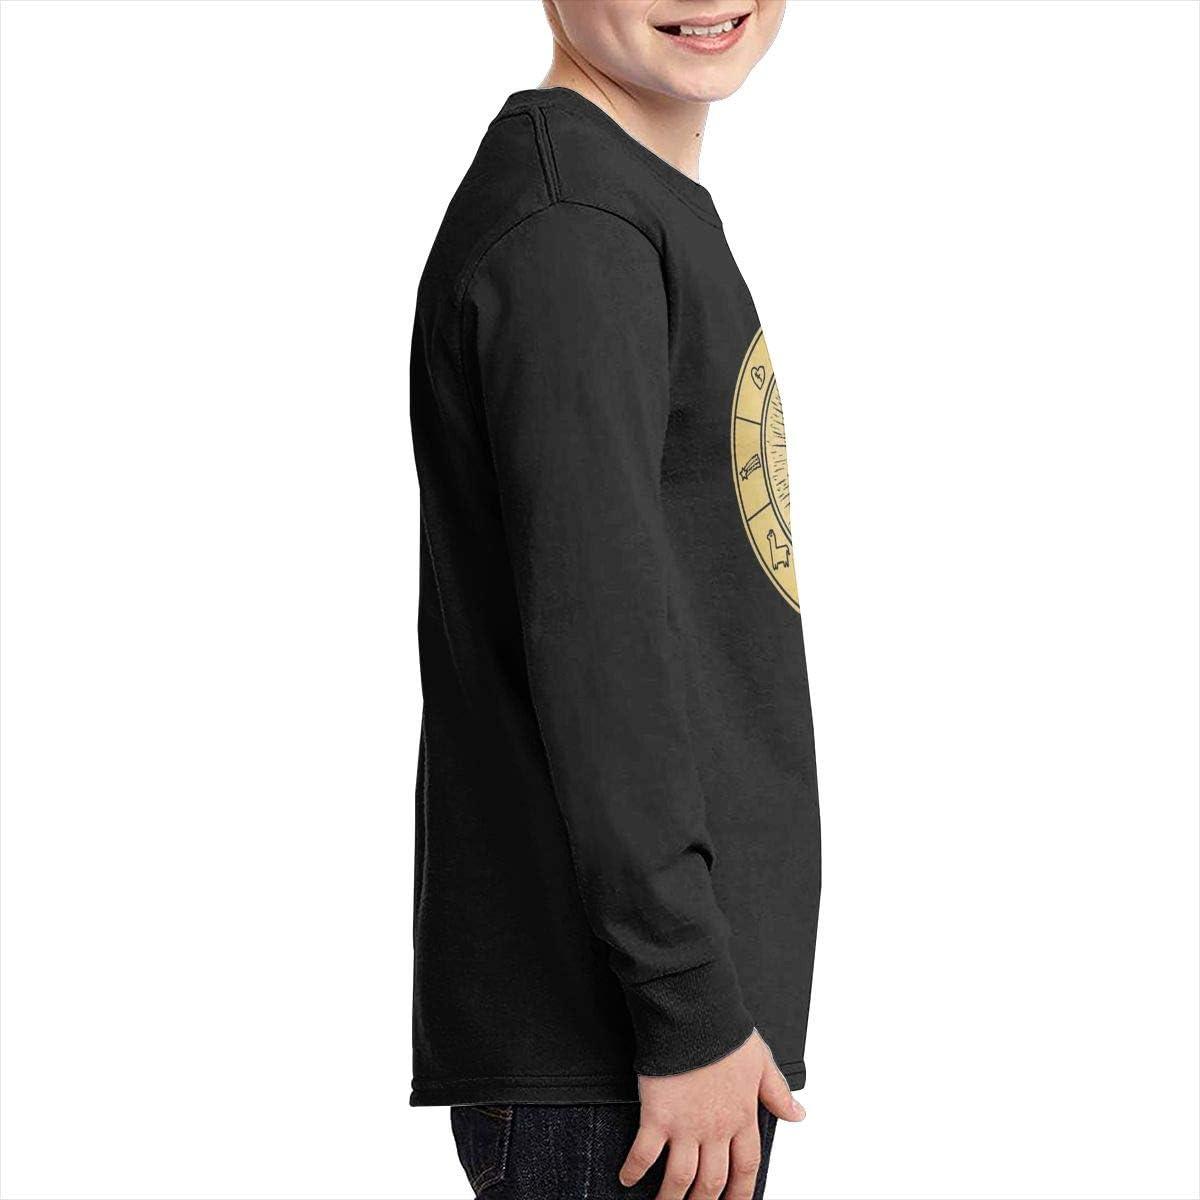 Optumus Gravity Falls Vintage Kids Sweatshirts Long Sleeve T Shirt Boy Girl Children Teenagers Unisex Tee